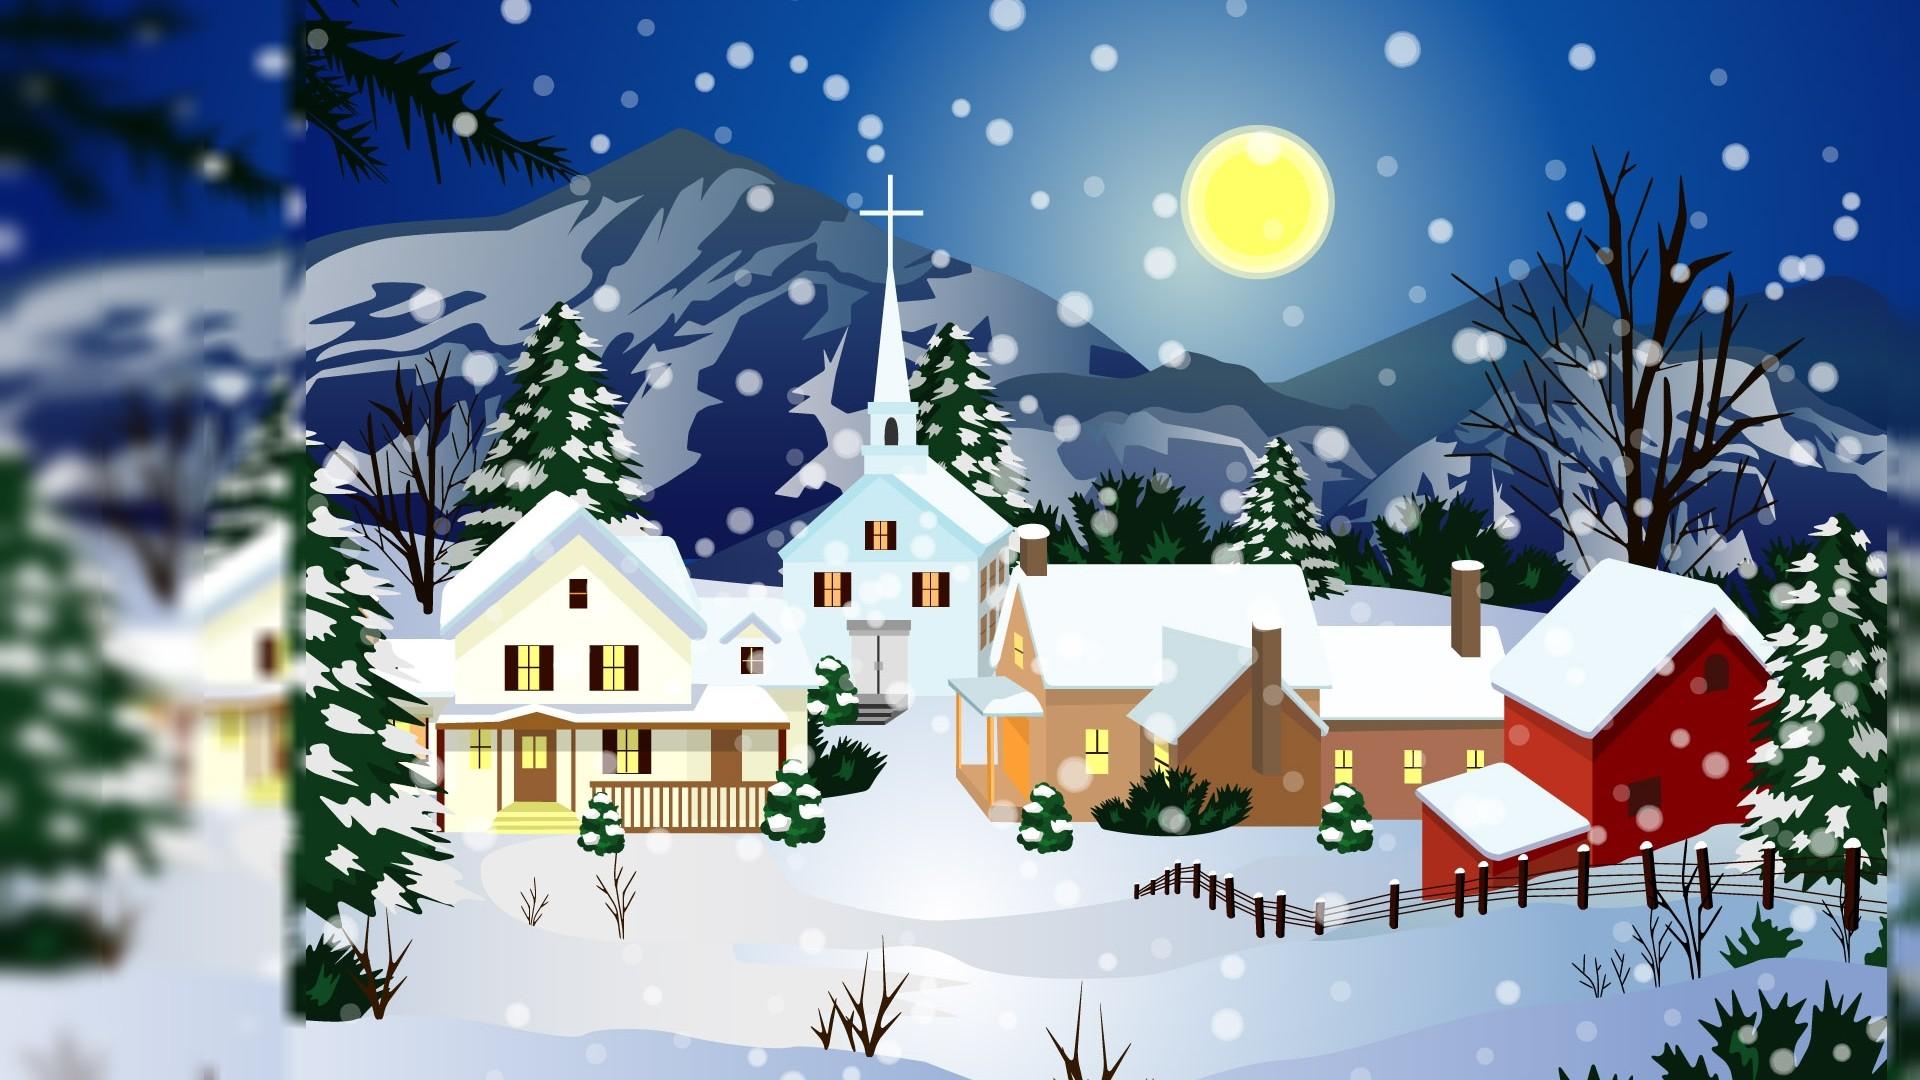 Animated Christmas Image. Free Newest Animated Christmas Wallpaper